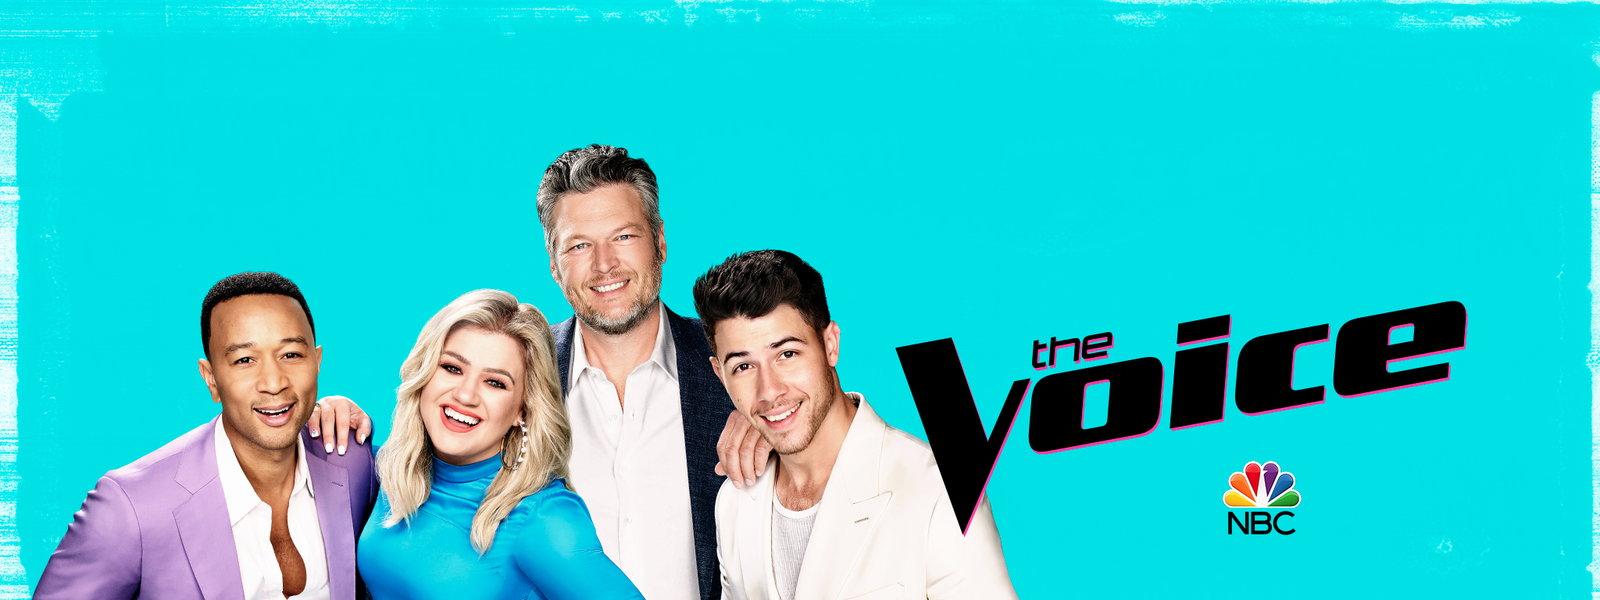 The Voice Episodes